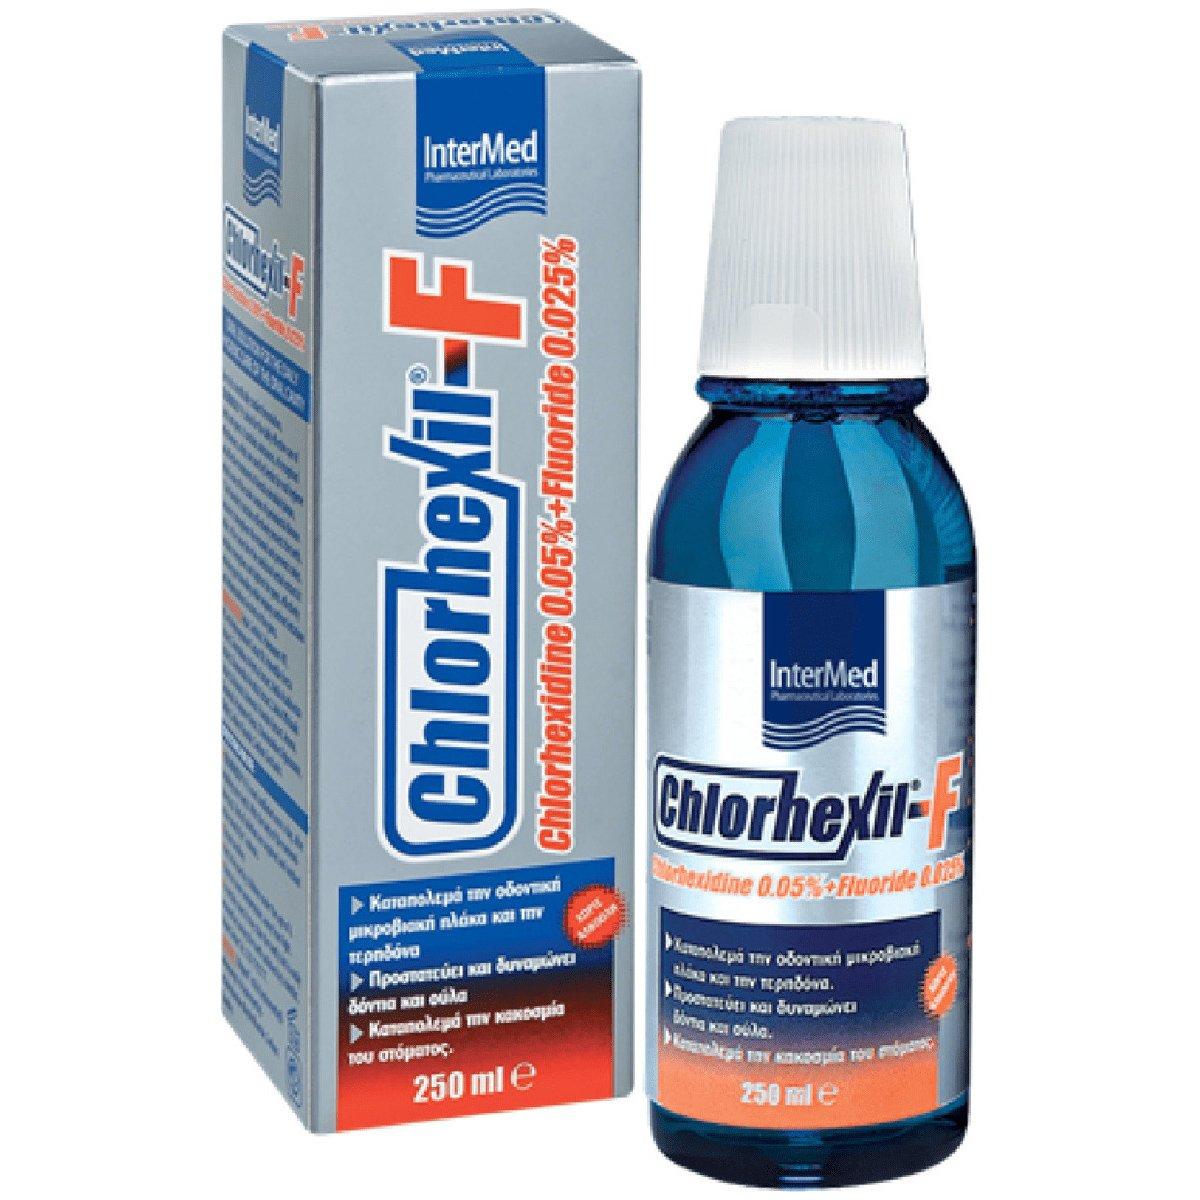 Chlorhexil-F Mouthwash Φθοριούχο Στοματικό Διάλυμα με Αντισηπτική Δράση για Καθημερινή Χρήση 250ml